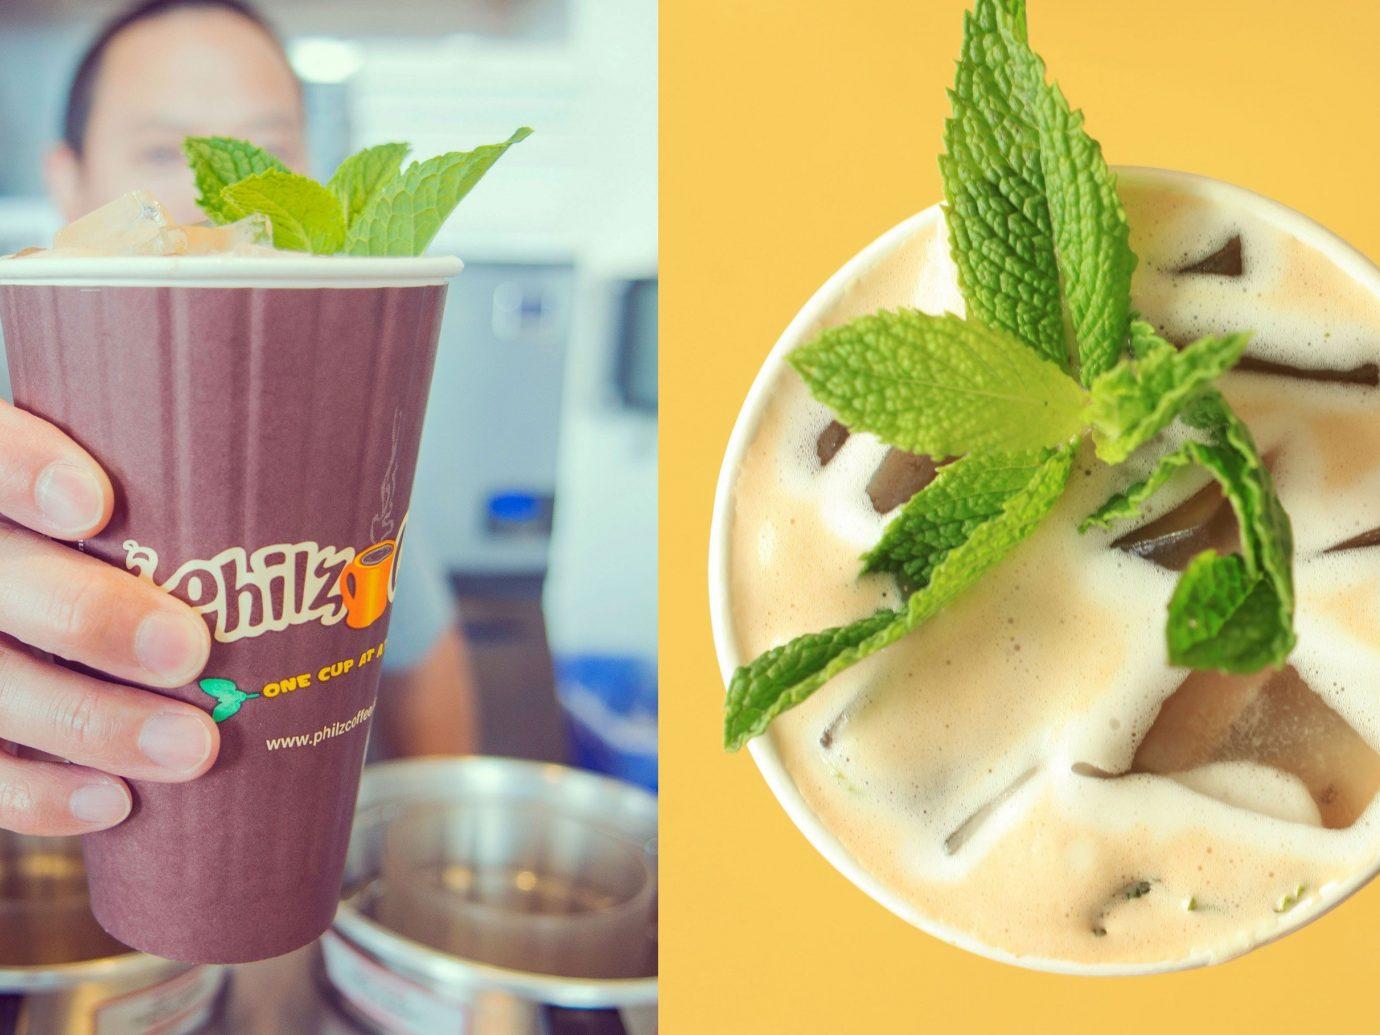 Food + Drink table cup food indoor Drink milkshake meal produce dish mojito dessert breakfast